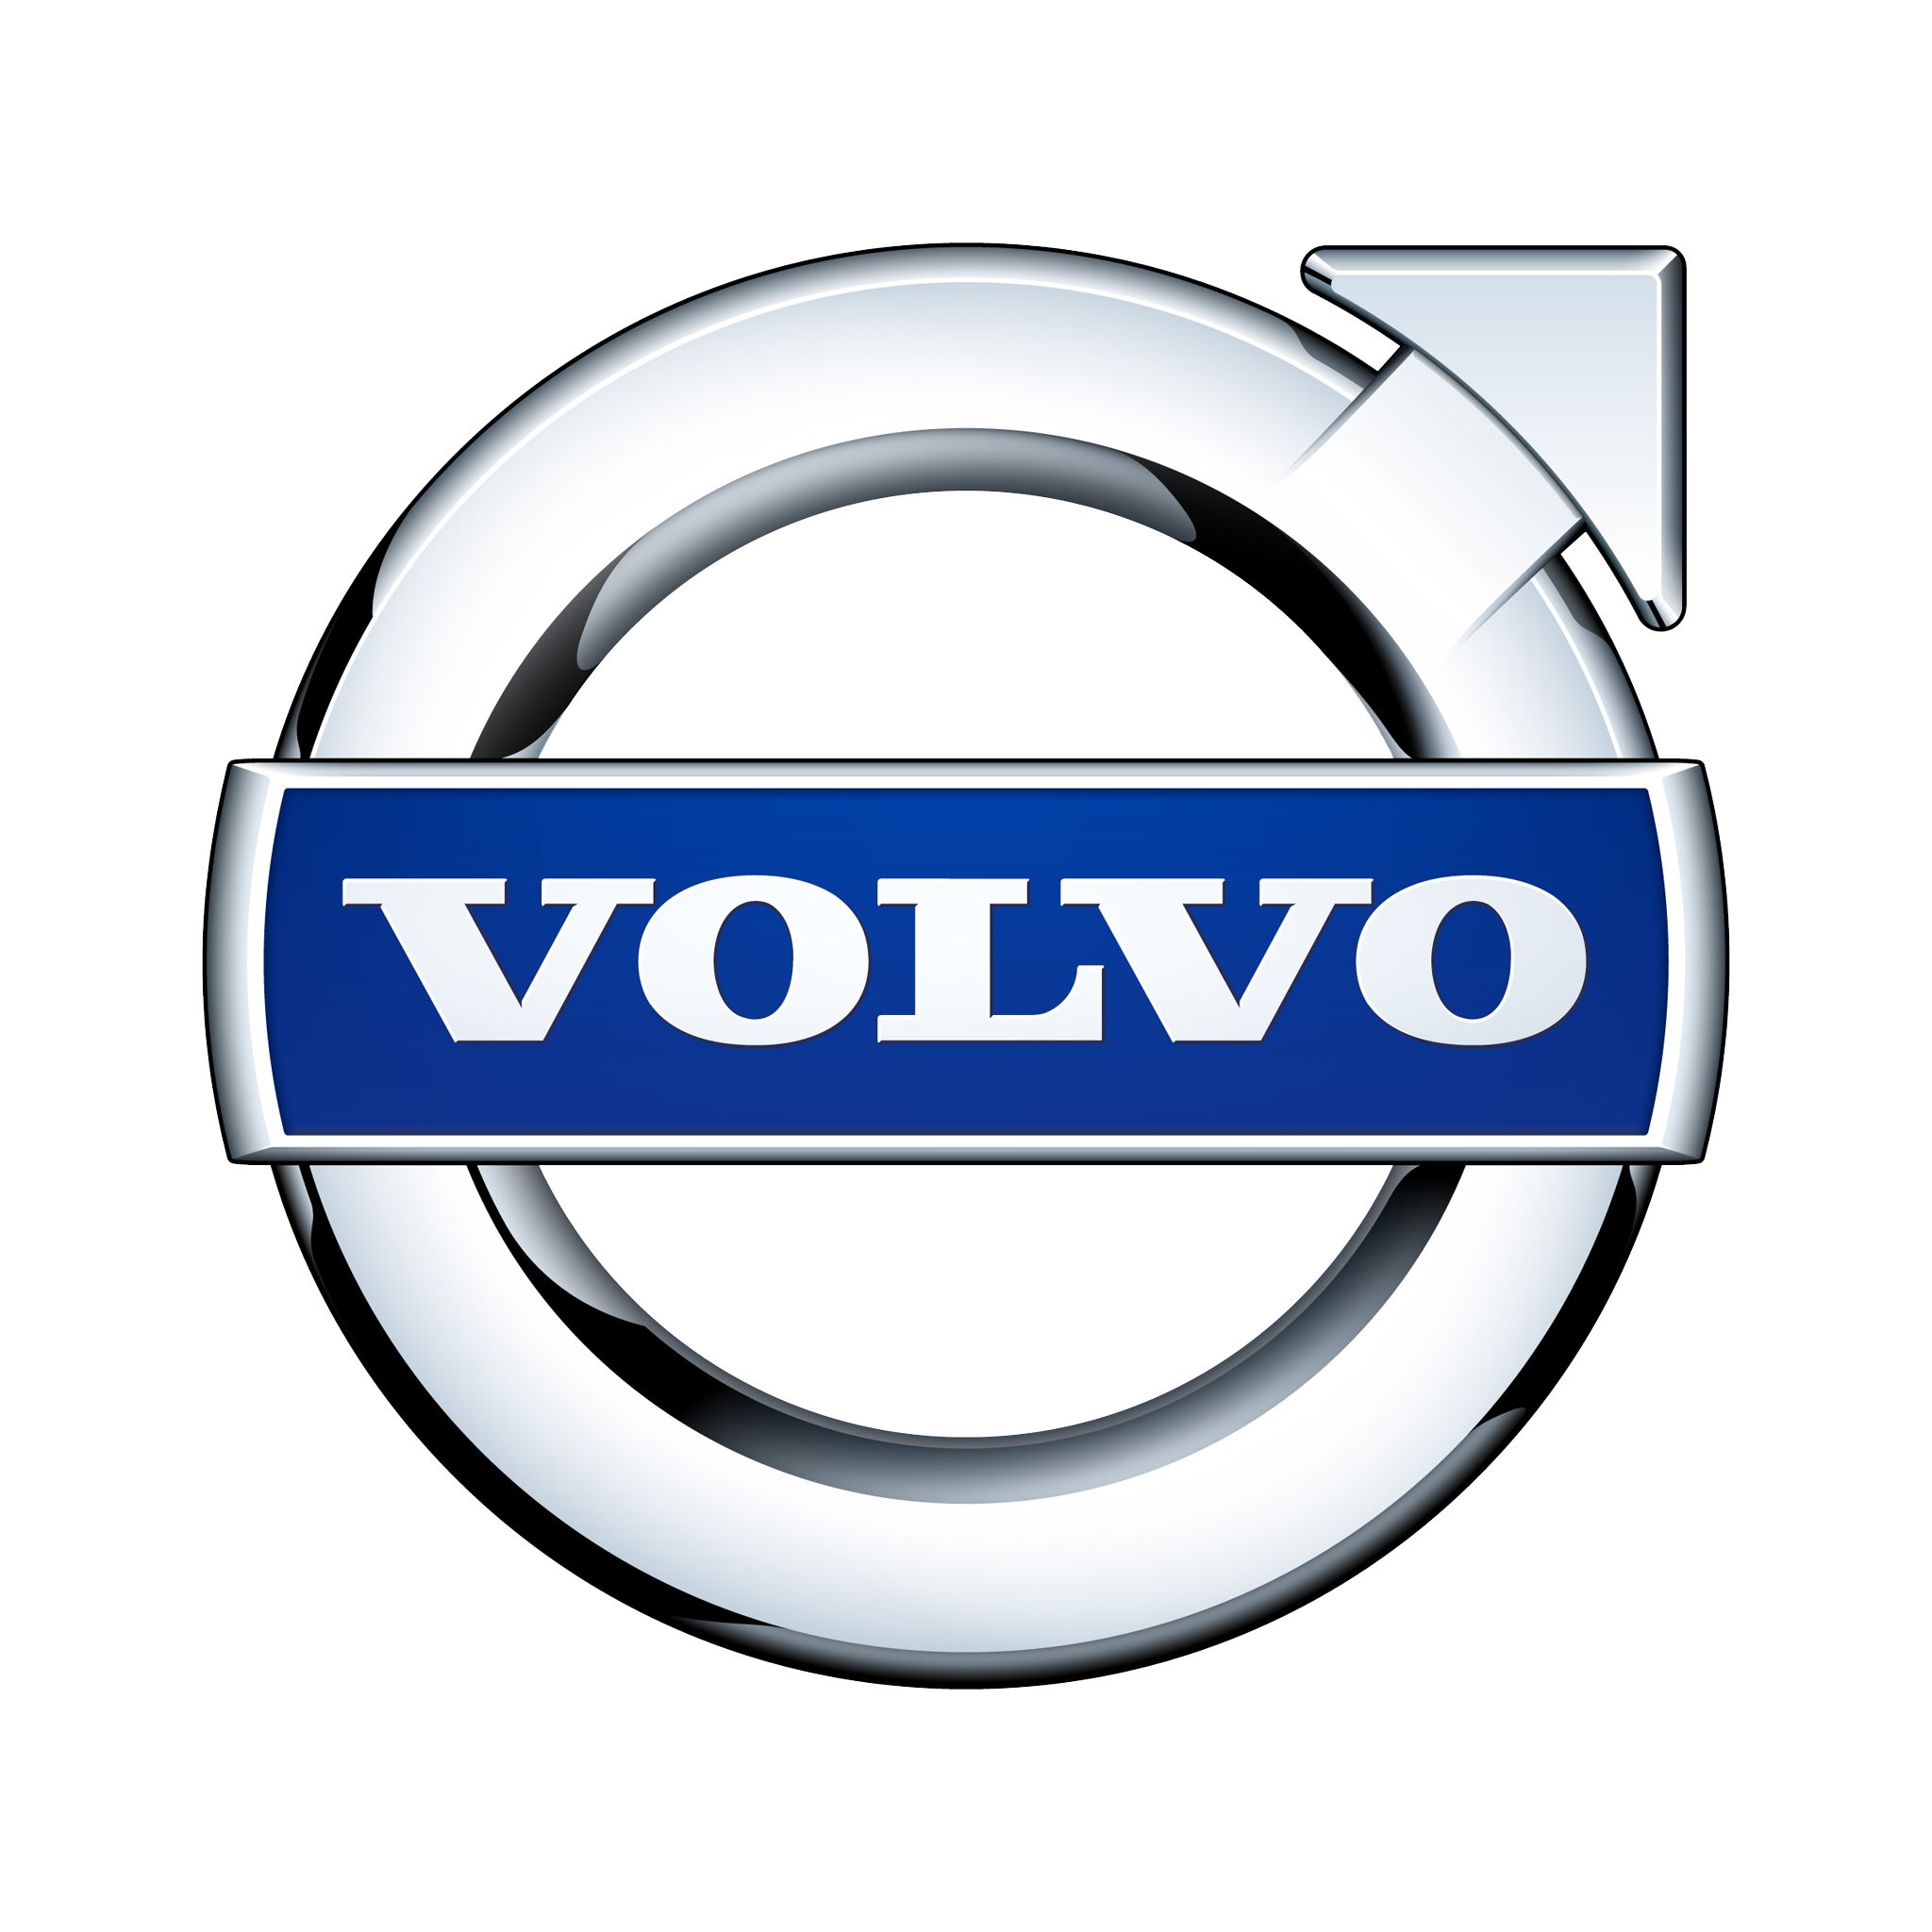 Volvo Car Wallpaper: Volvo Raktų Gamyba / Programavimas